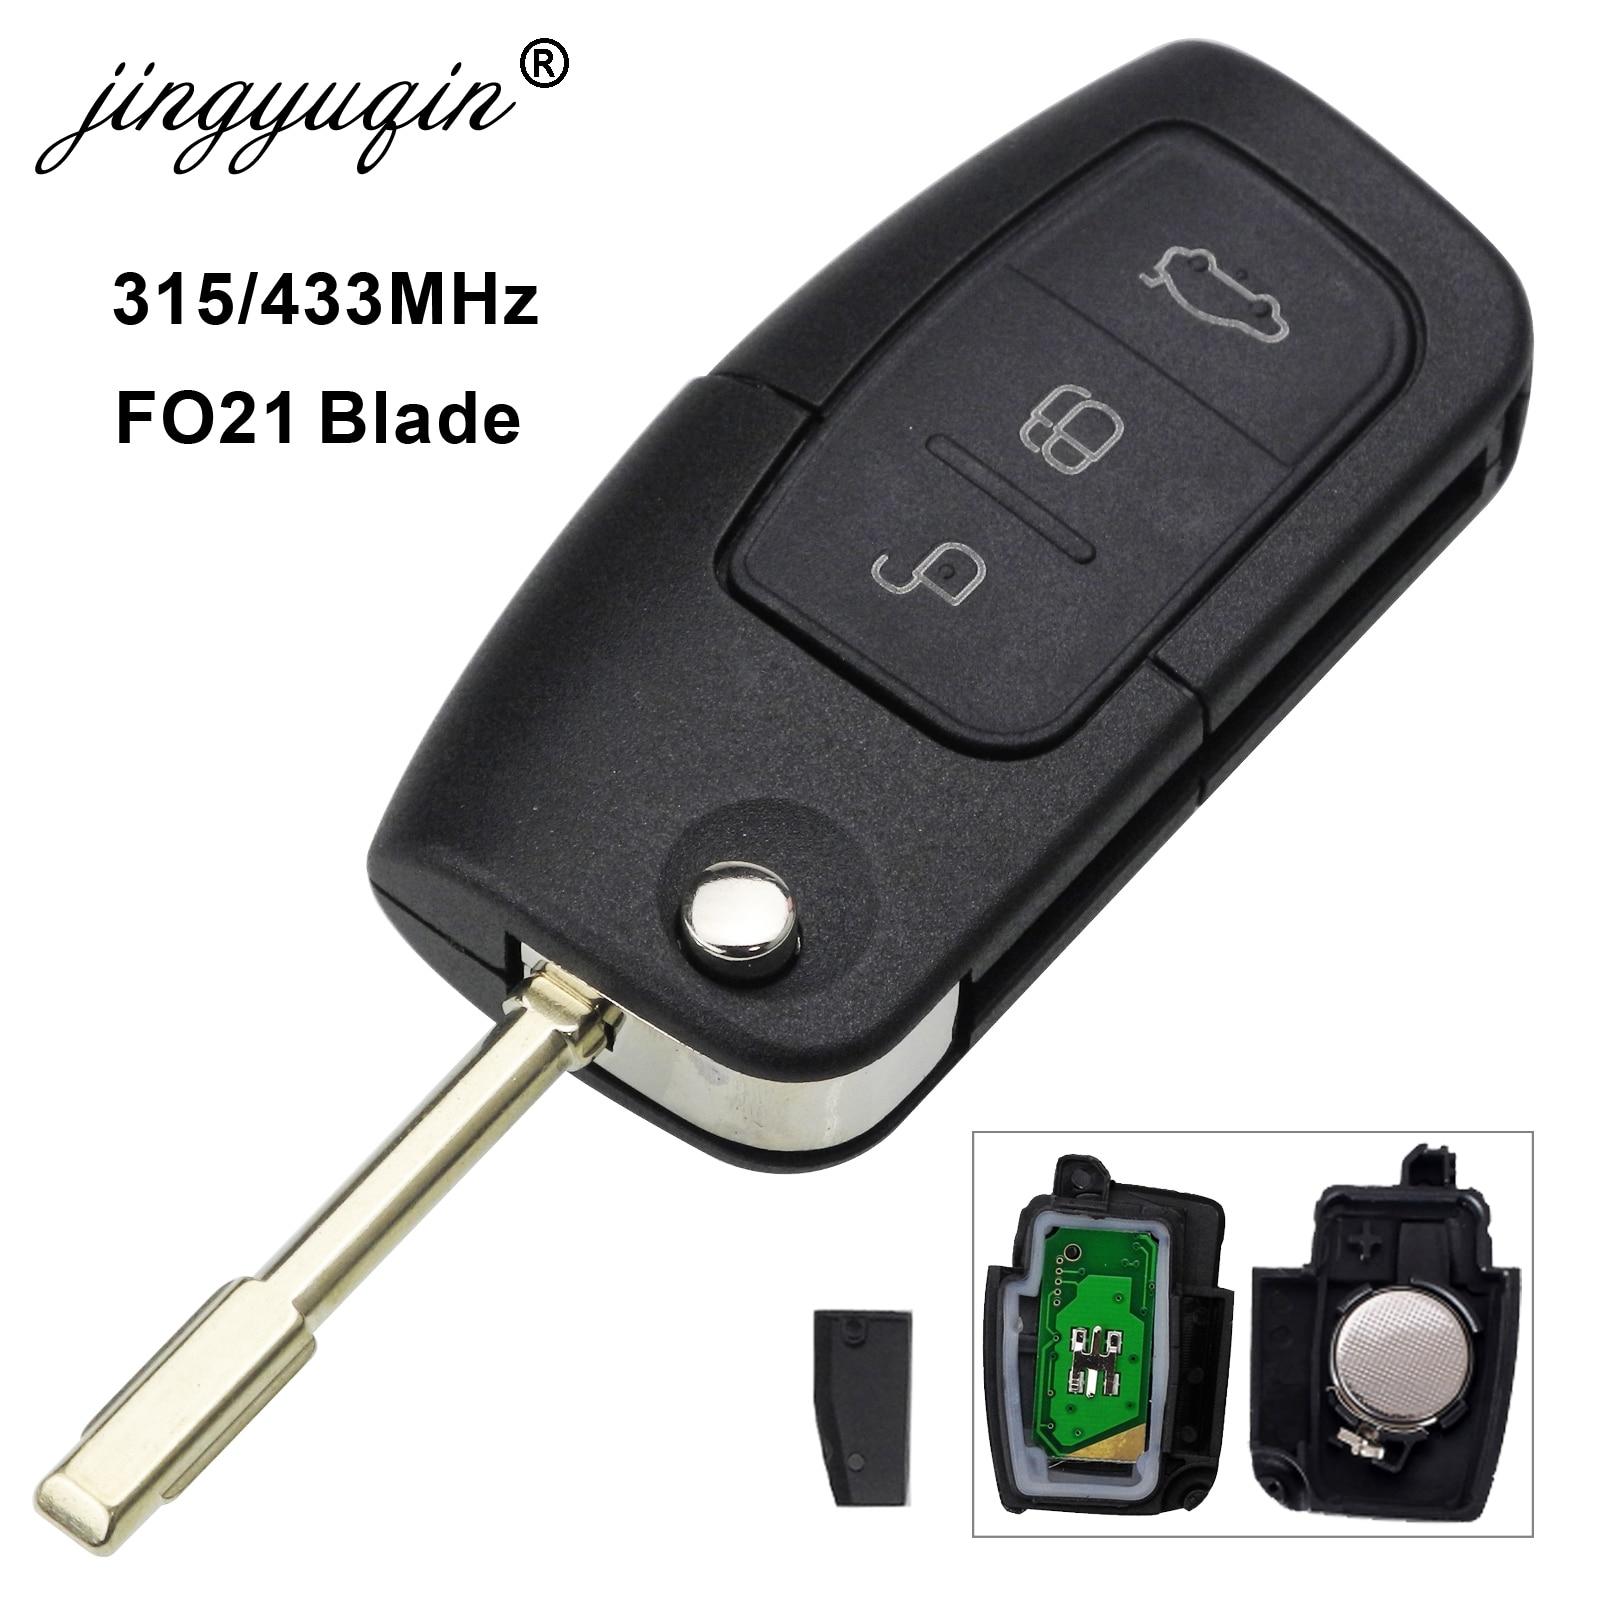 Mando a distancia de 3 botones jingyuqin, 433/315MHz, 4D63 4D60 para Ford Focus Mondeo Galaxy Fiesta C Max S Max FO21, llave plegable con tapa